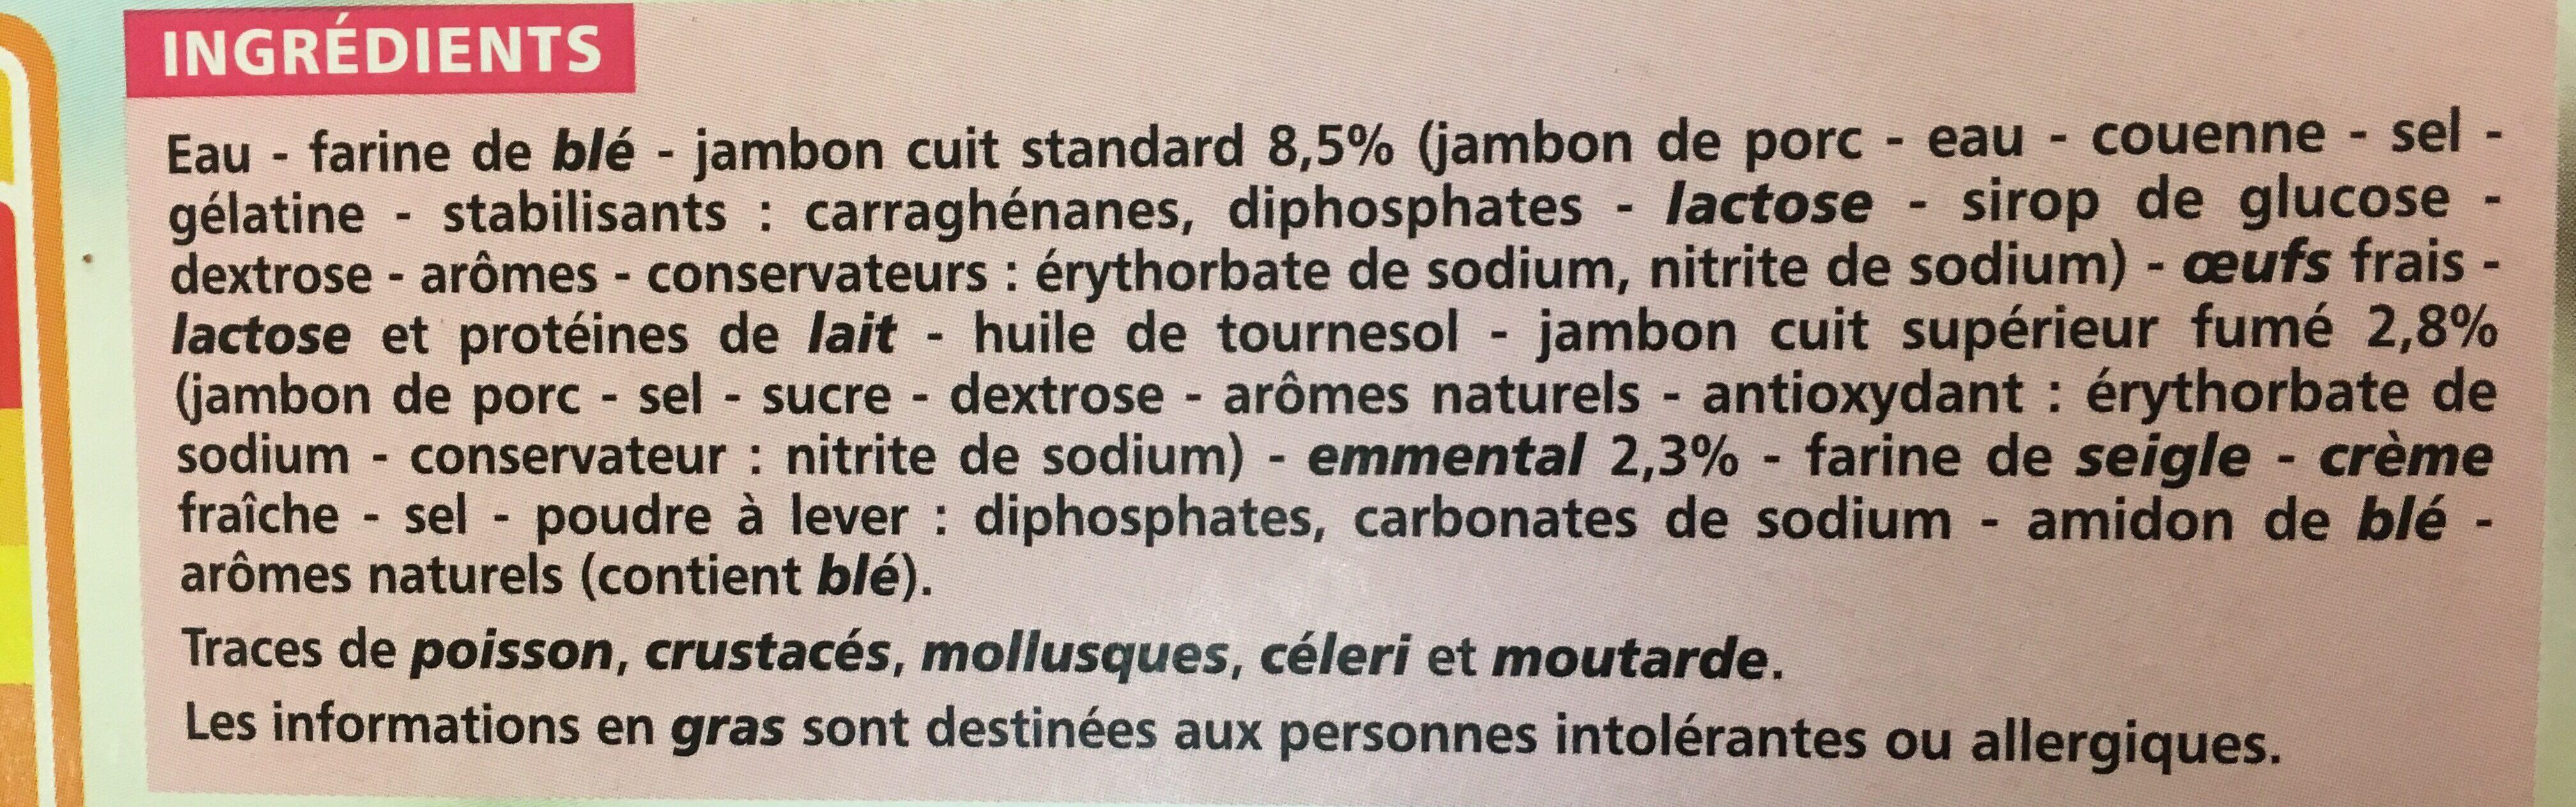 Crêpes Jambon Fromage surgelées - Ingredients - fr